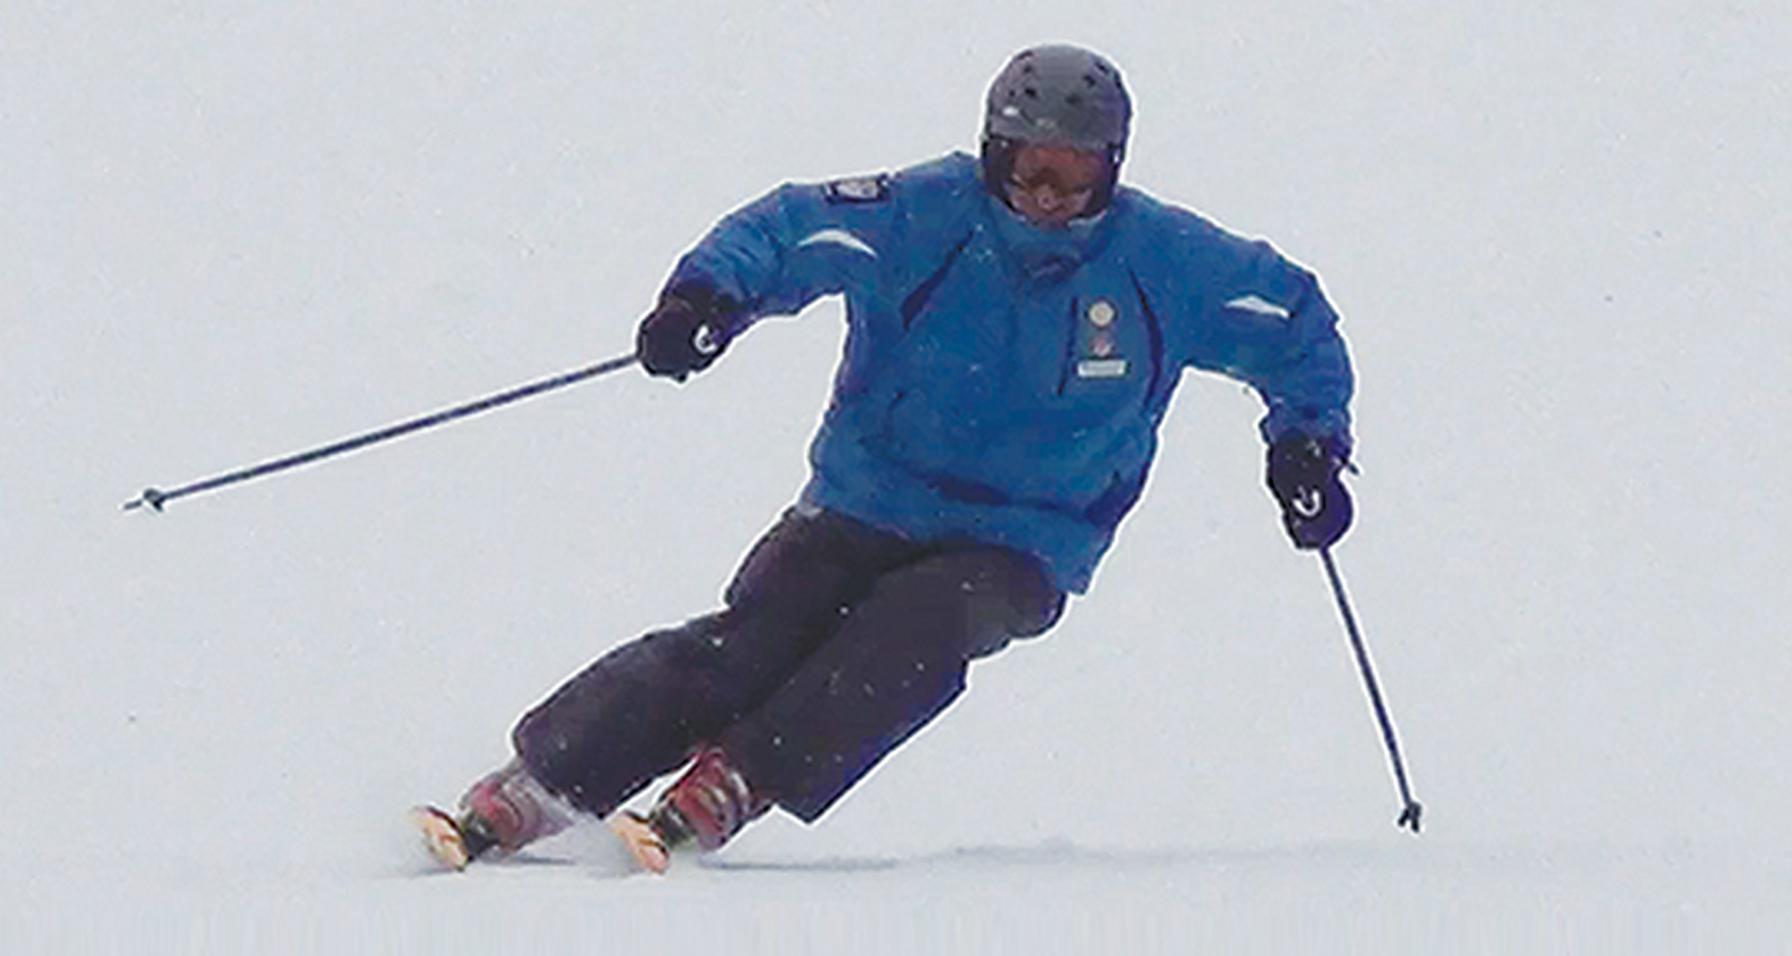 ski instruction PSIA-C